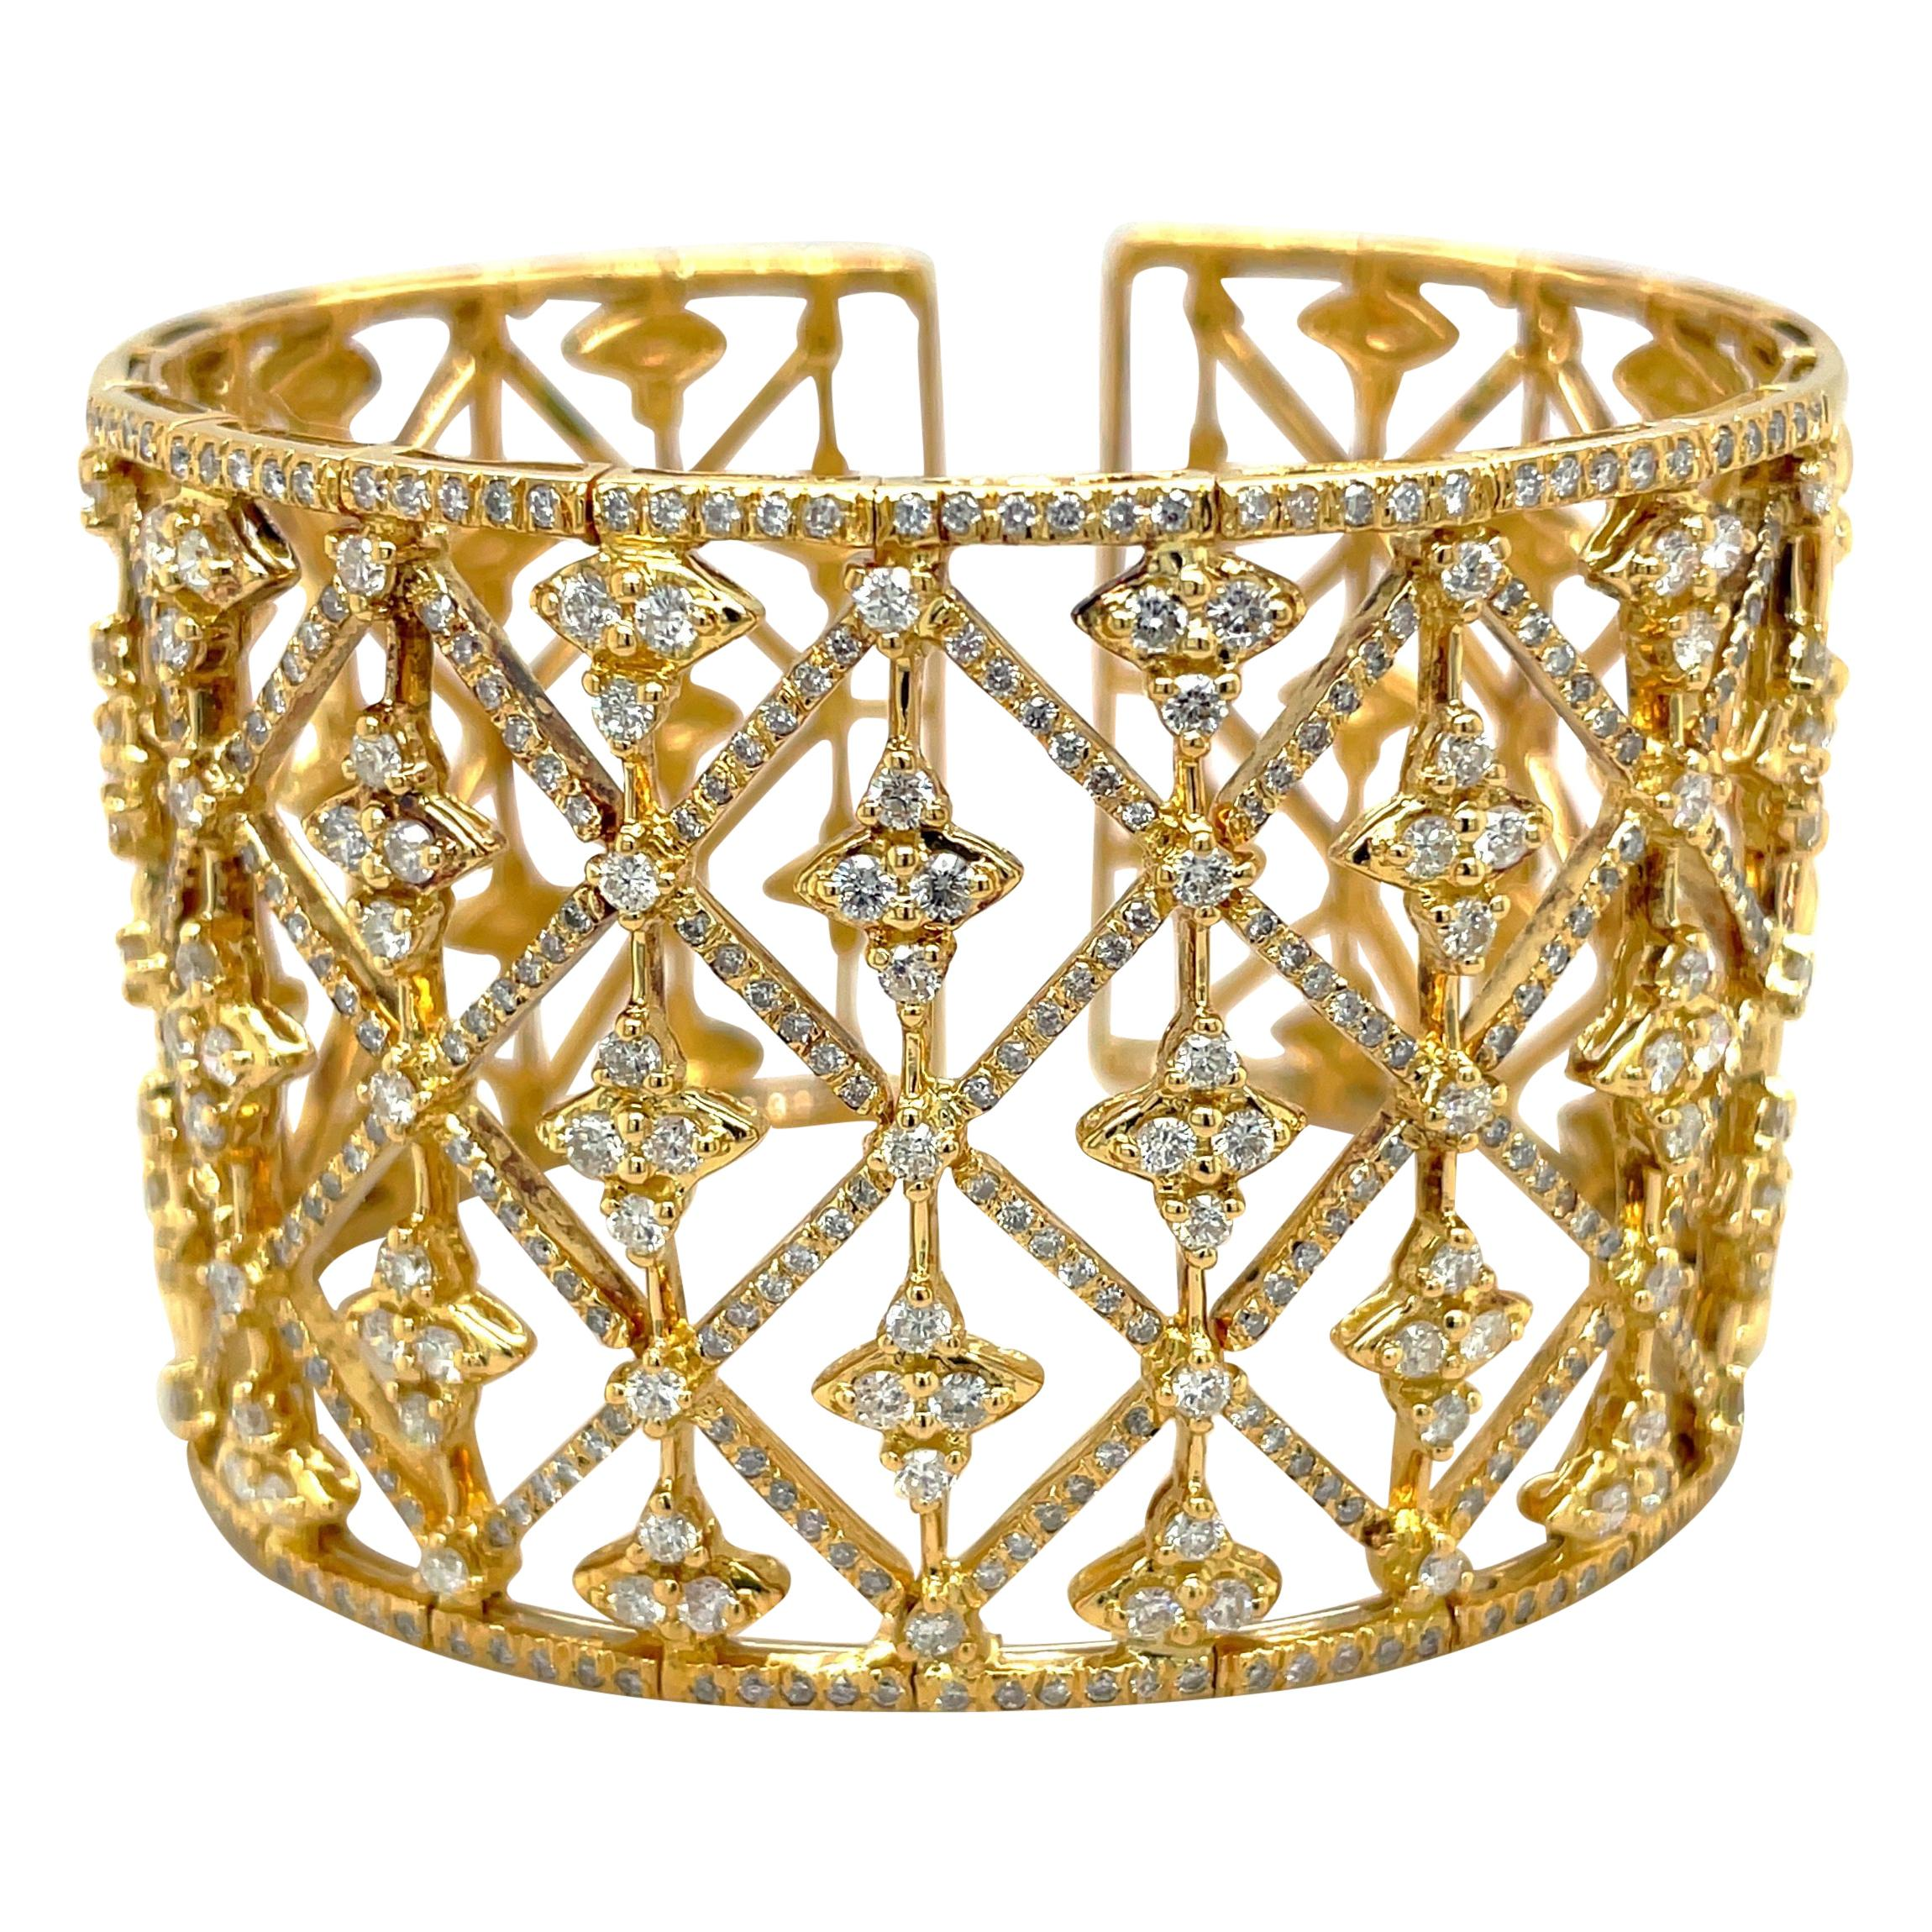 18kt Yellow Gold and Diamond 5.85ct Wide Openwork Cuff Bracelet